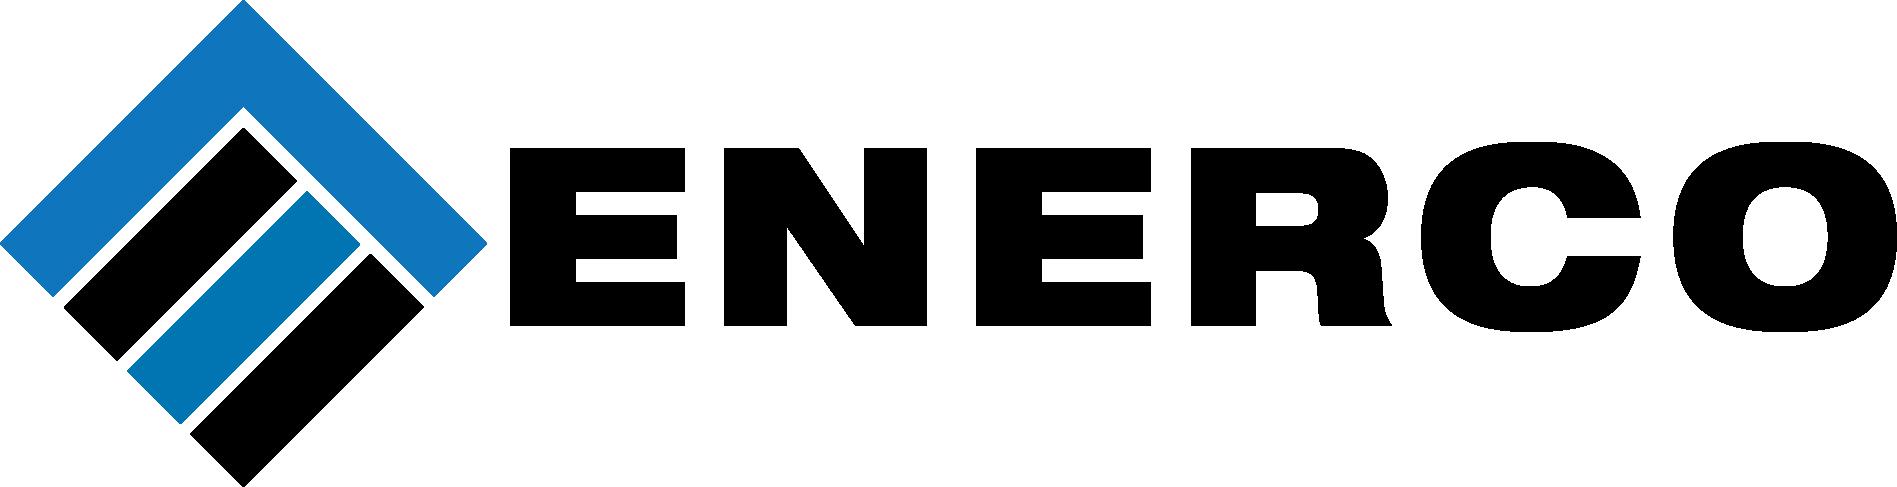 Propane Regulator 0-20 psi High Pressure Clamshell